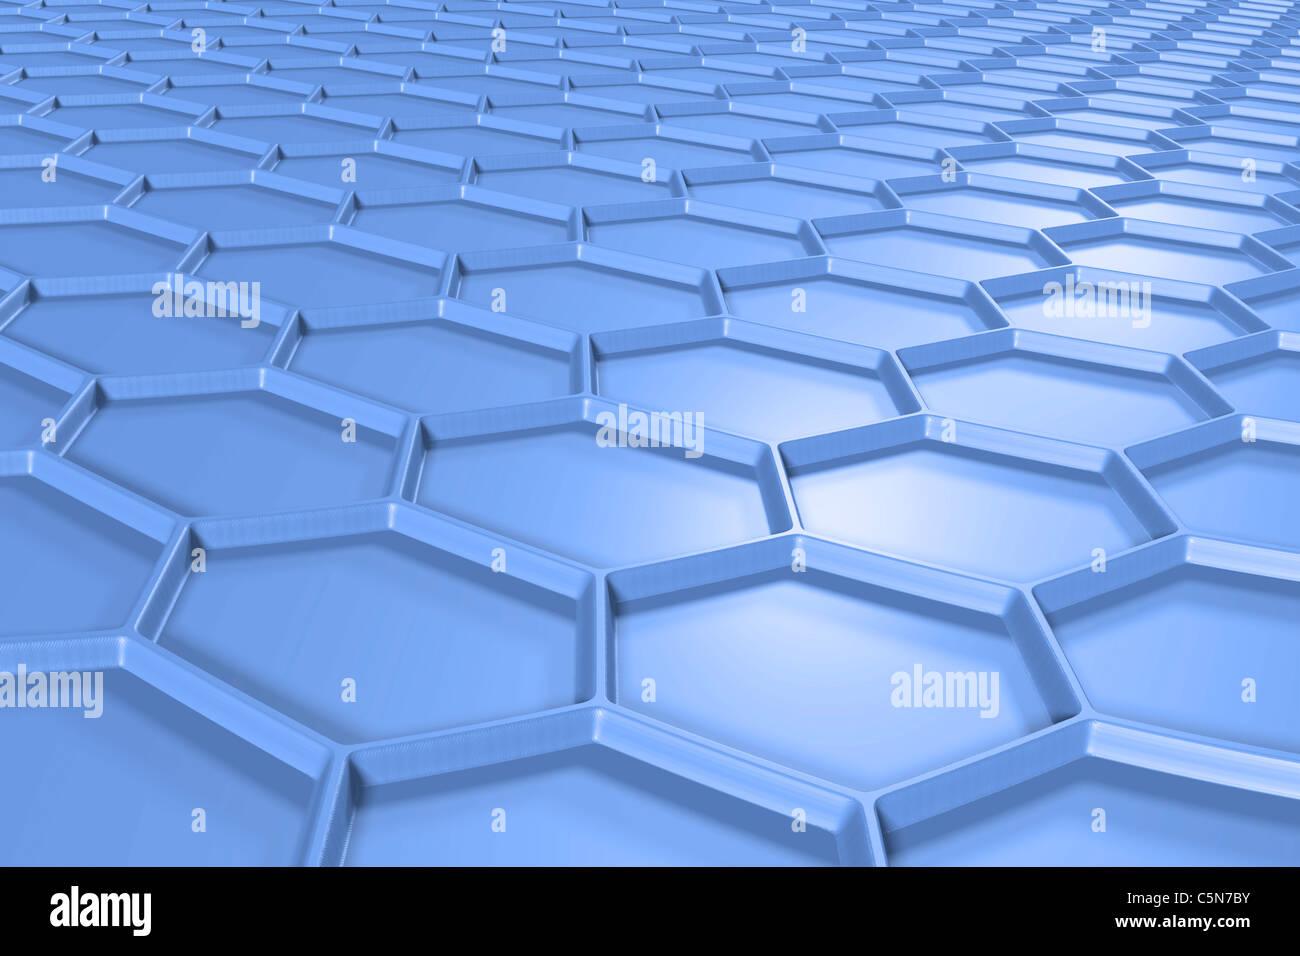 Estructura hexagonal azul. Imagen De Stock